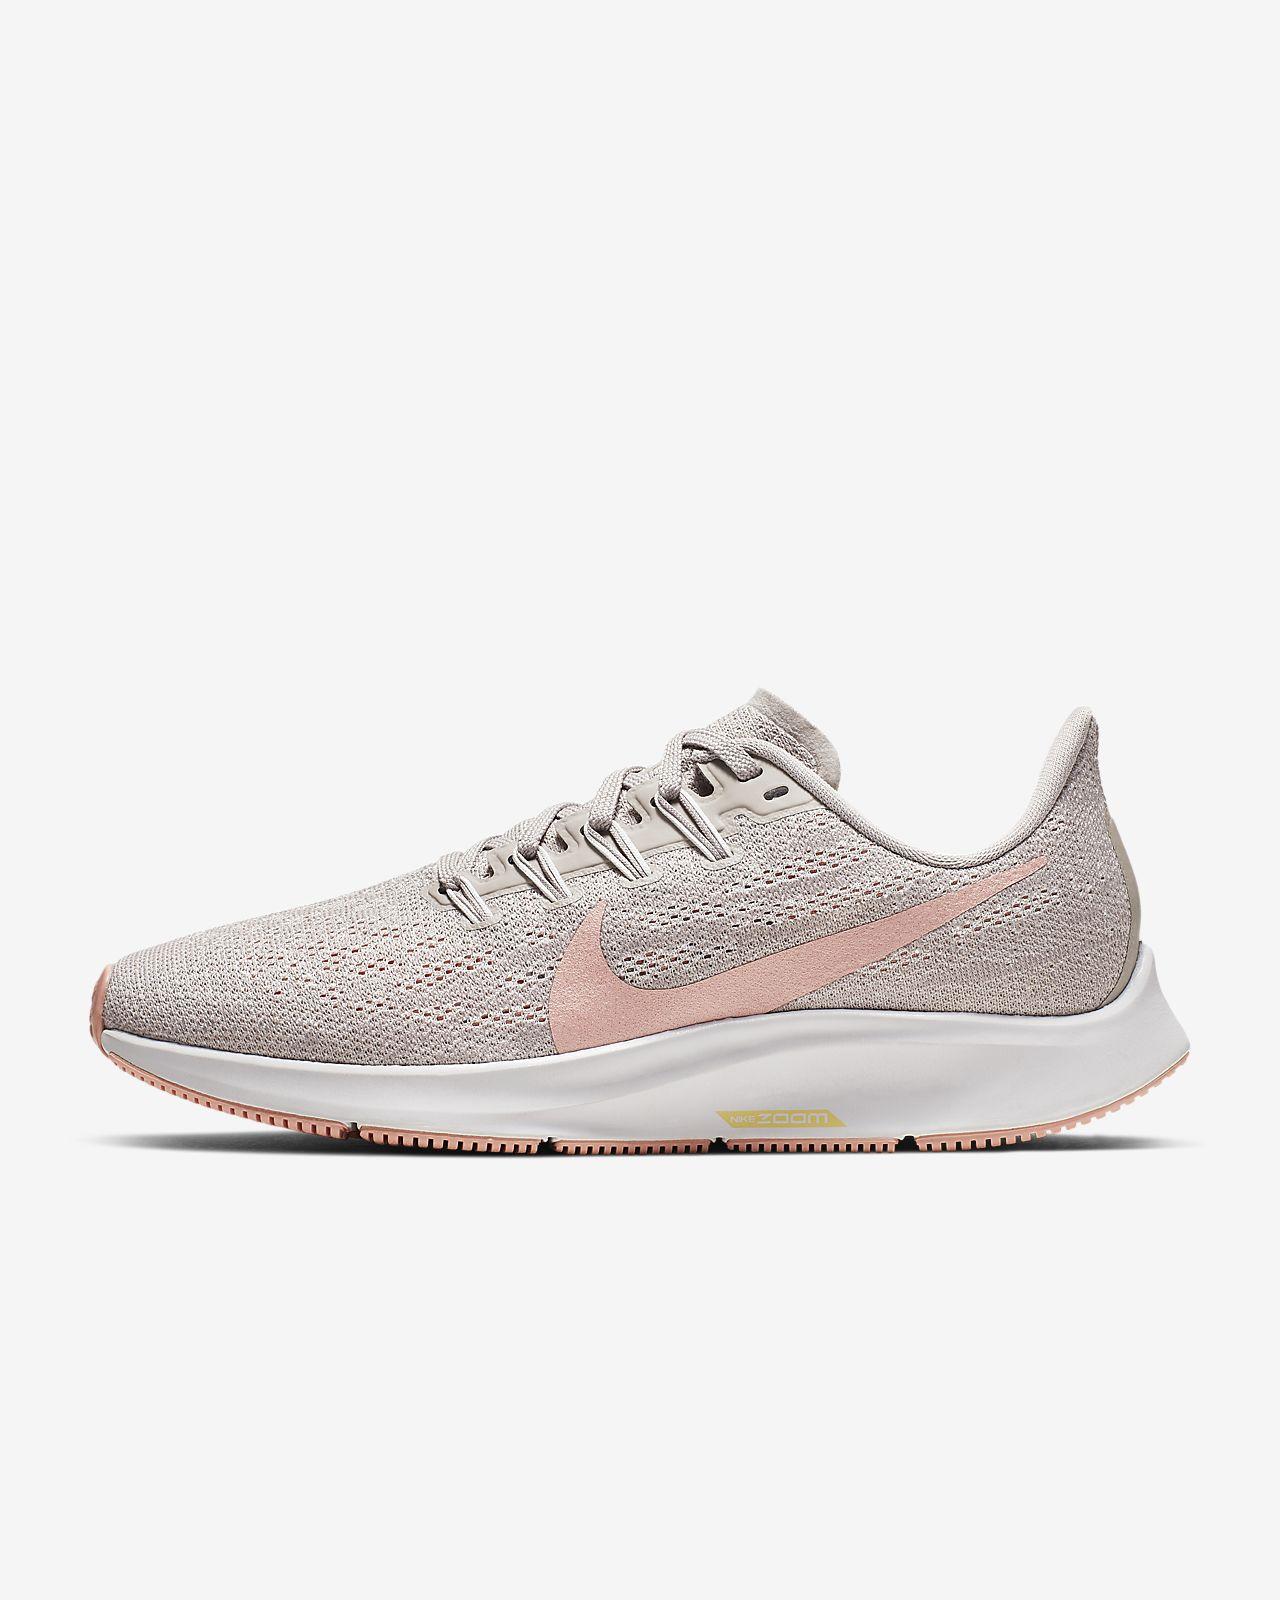 Damskie buty do biegania Nike Air Zoom Pegasus 36